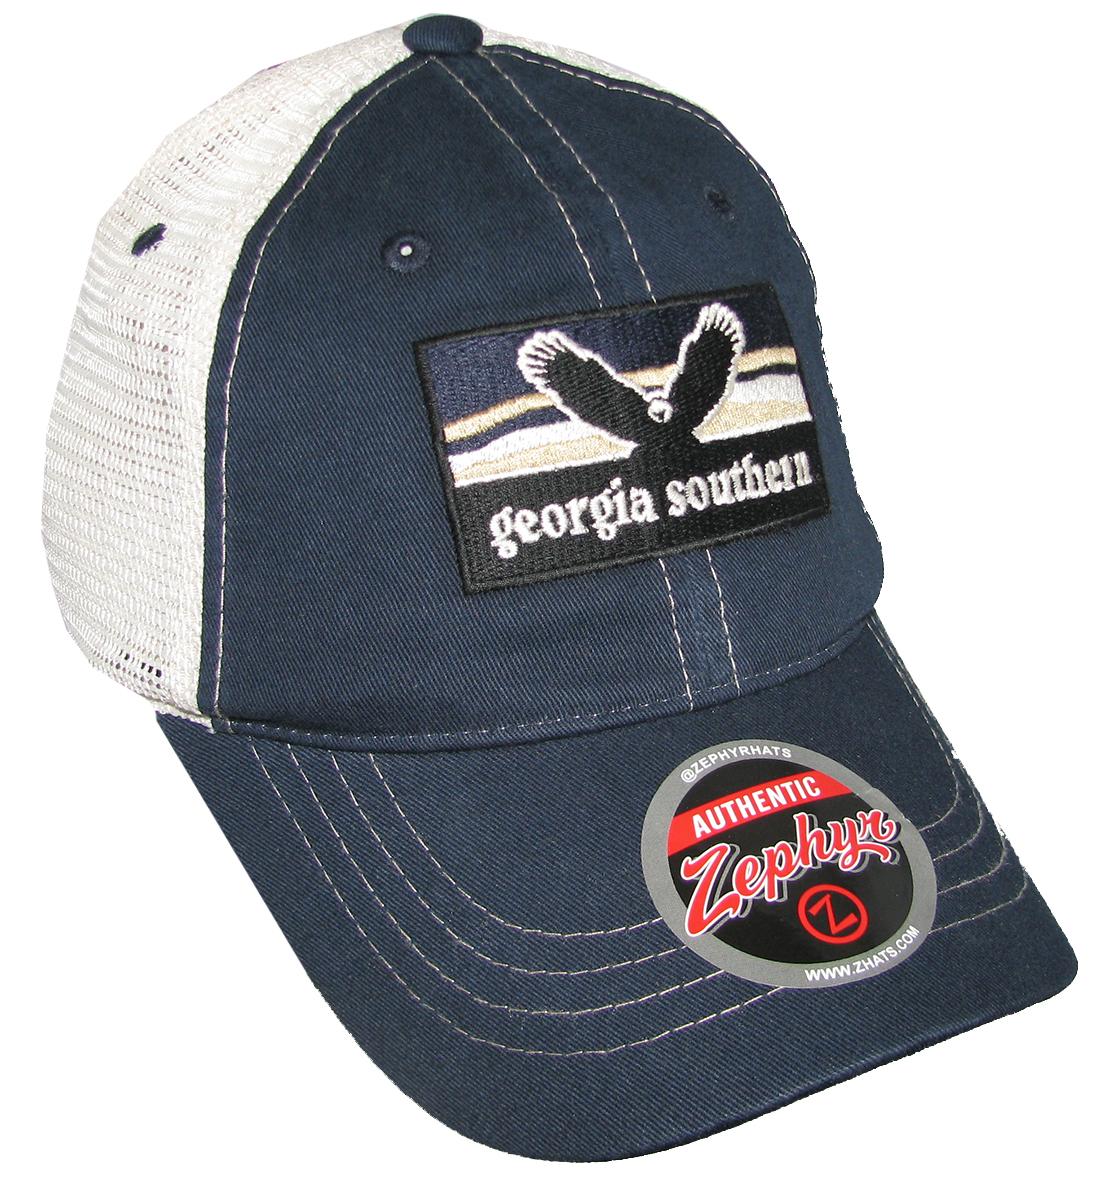 45e6c0be694 ... 50% off georgia southern university landmark washed mesh snap back hat  trenz shirt company 389f6 ...